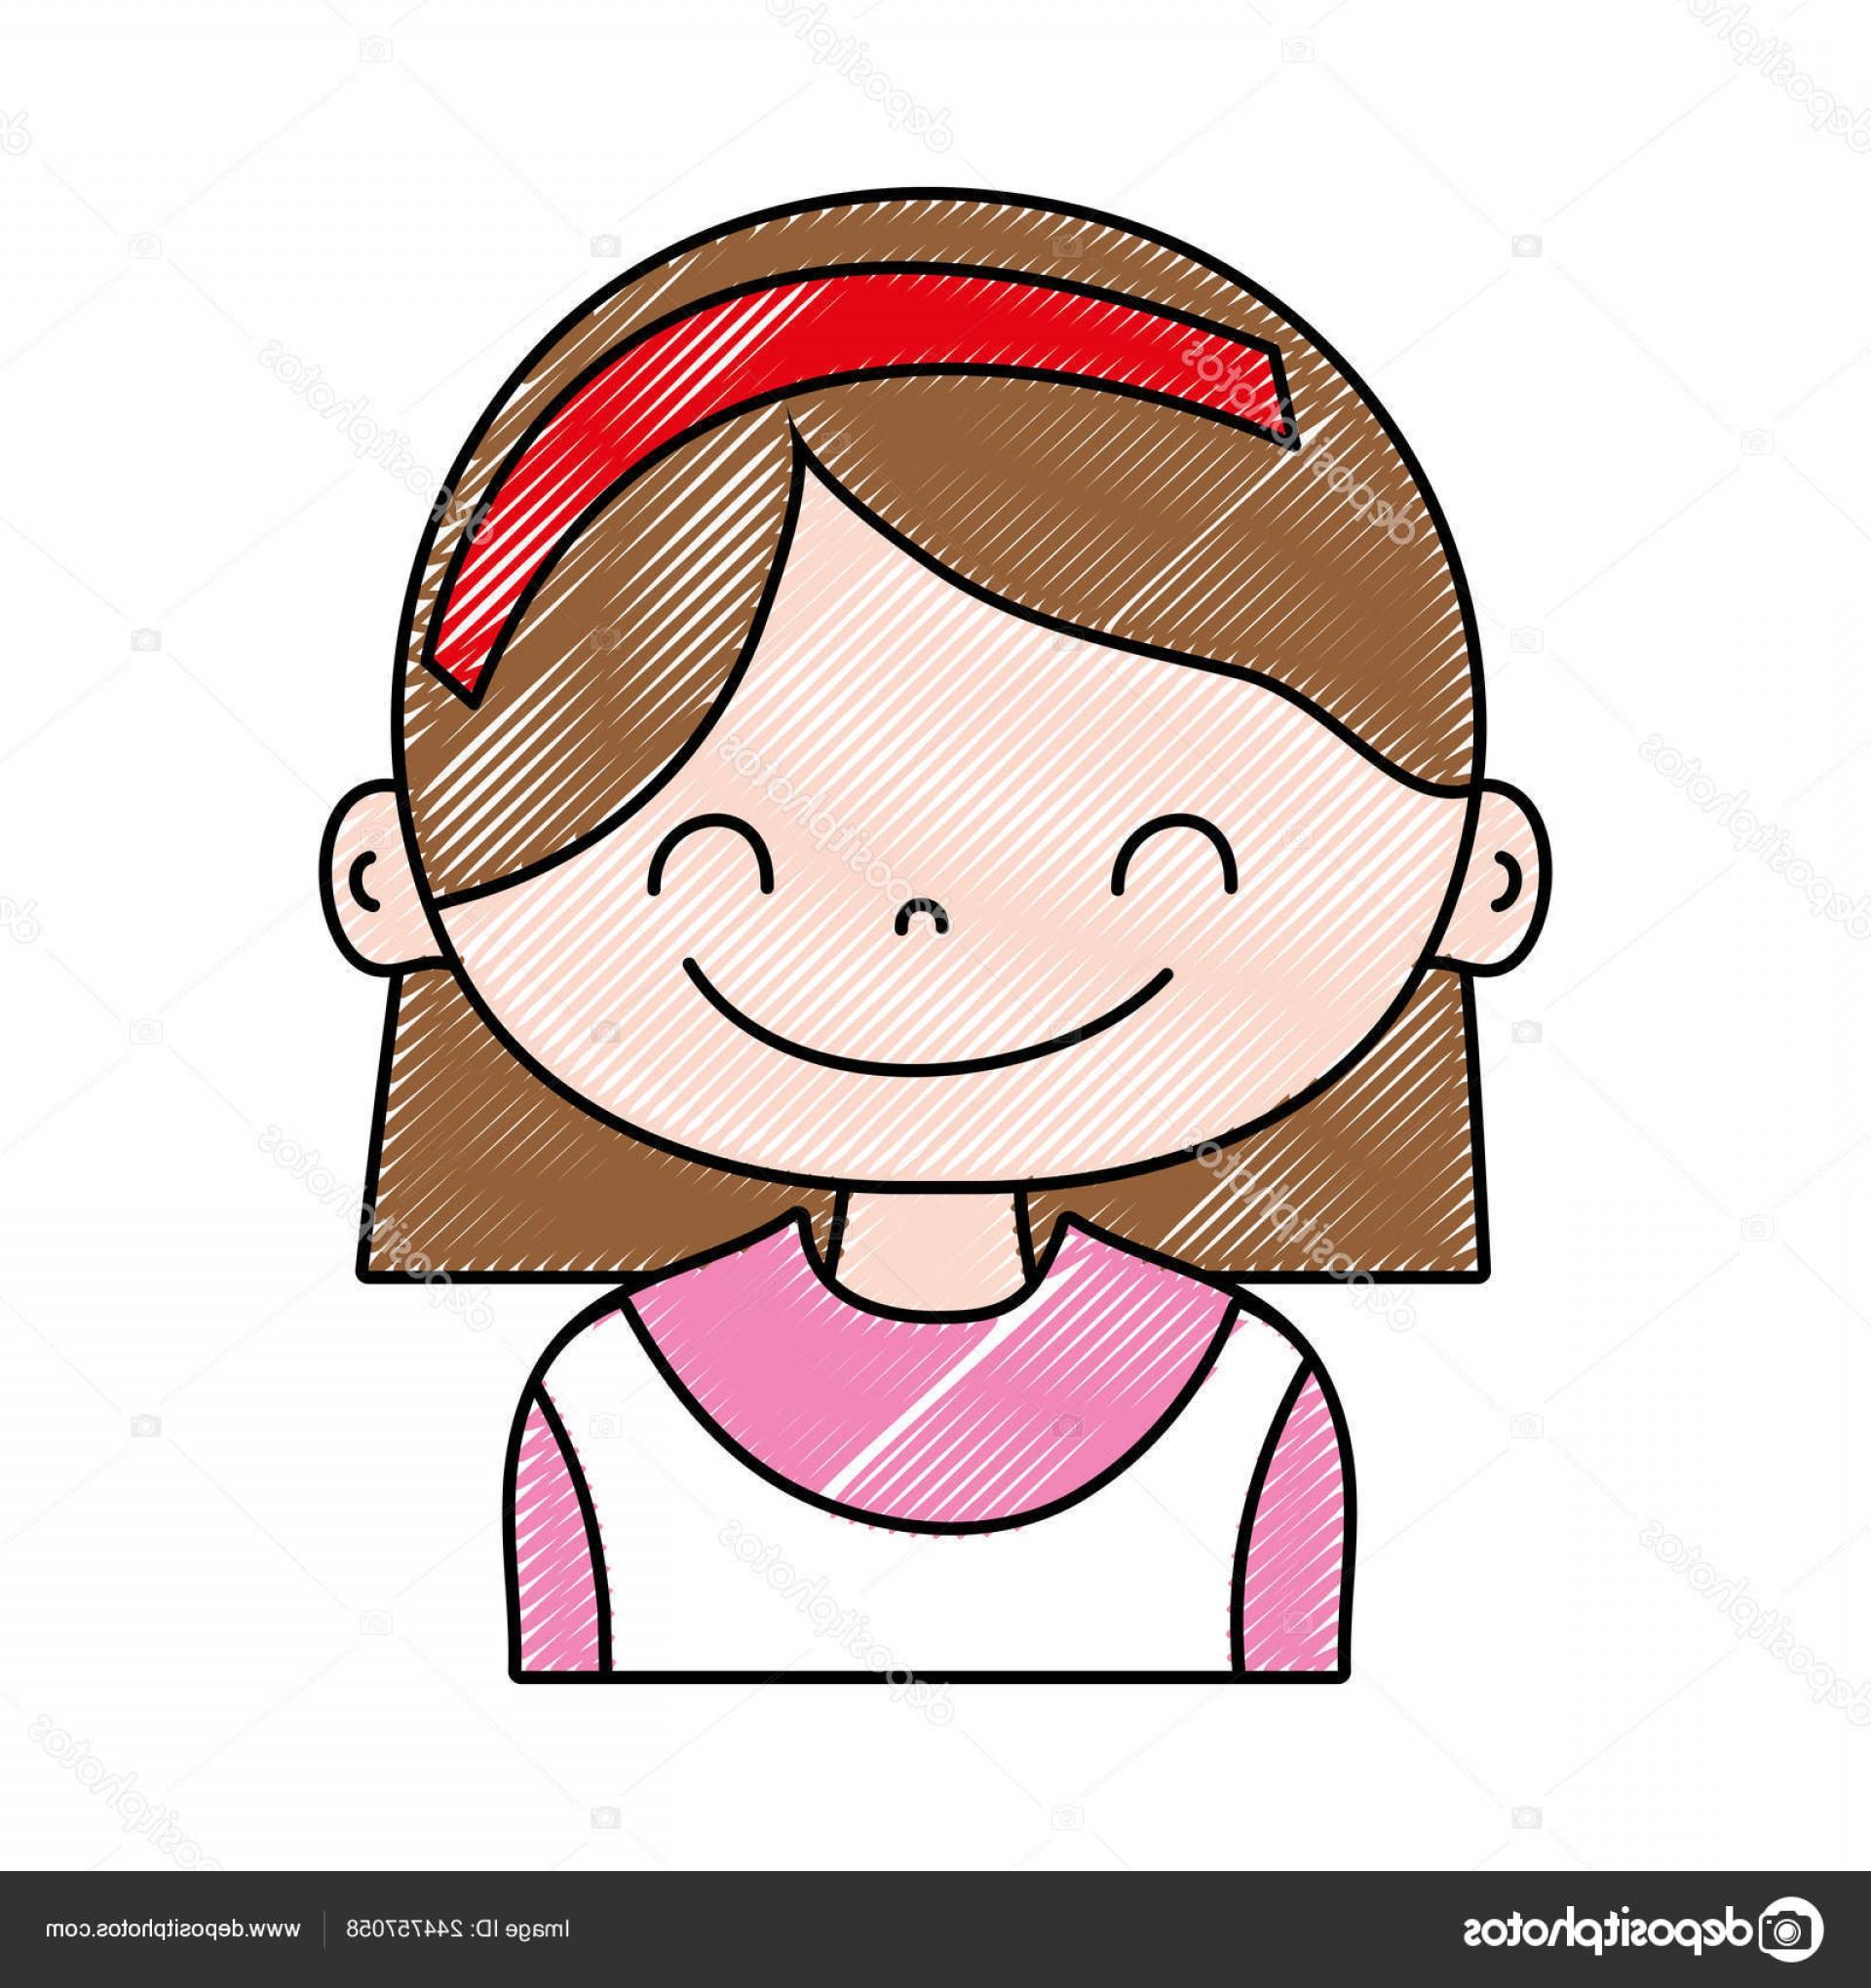 Retro little girl orange jumper & pink headband clipart cartoon